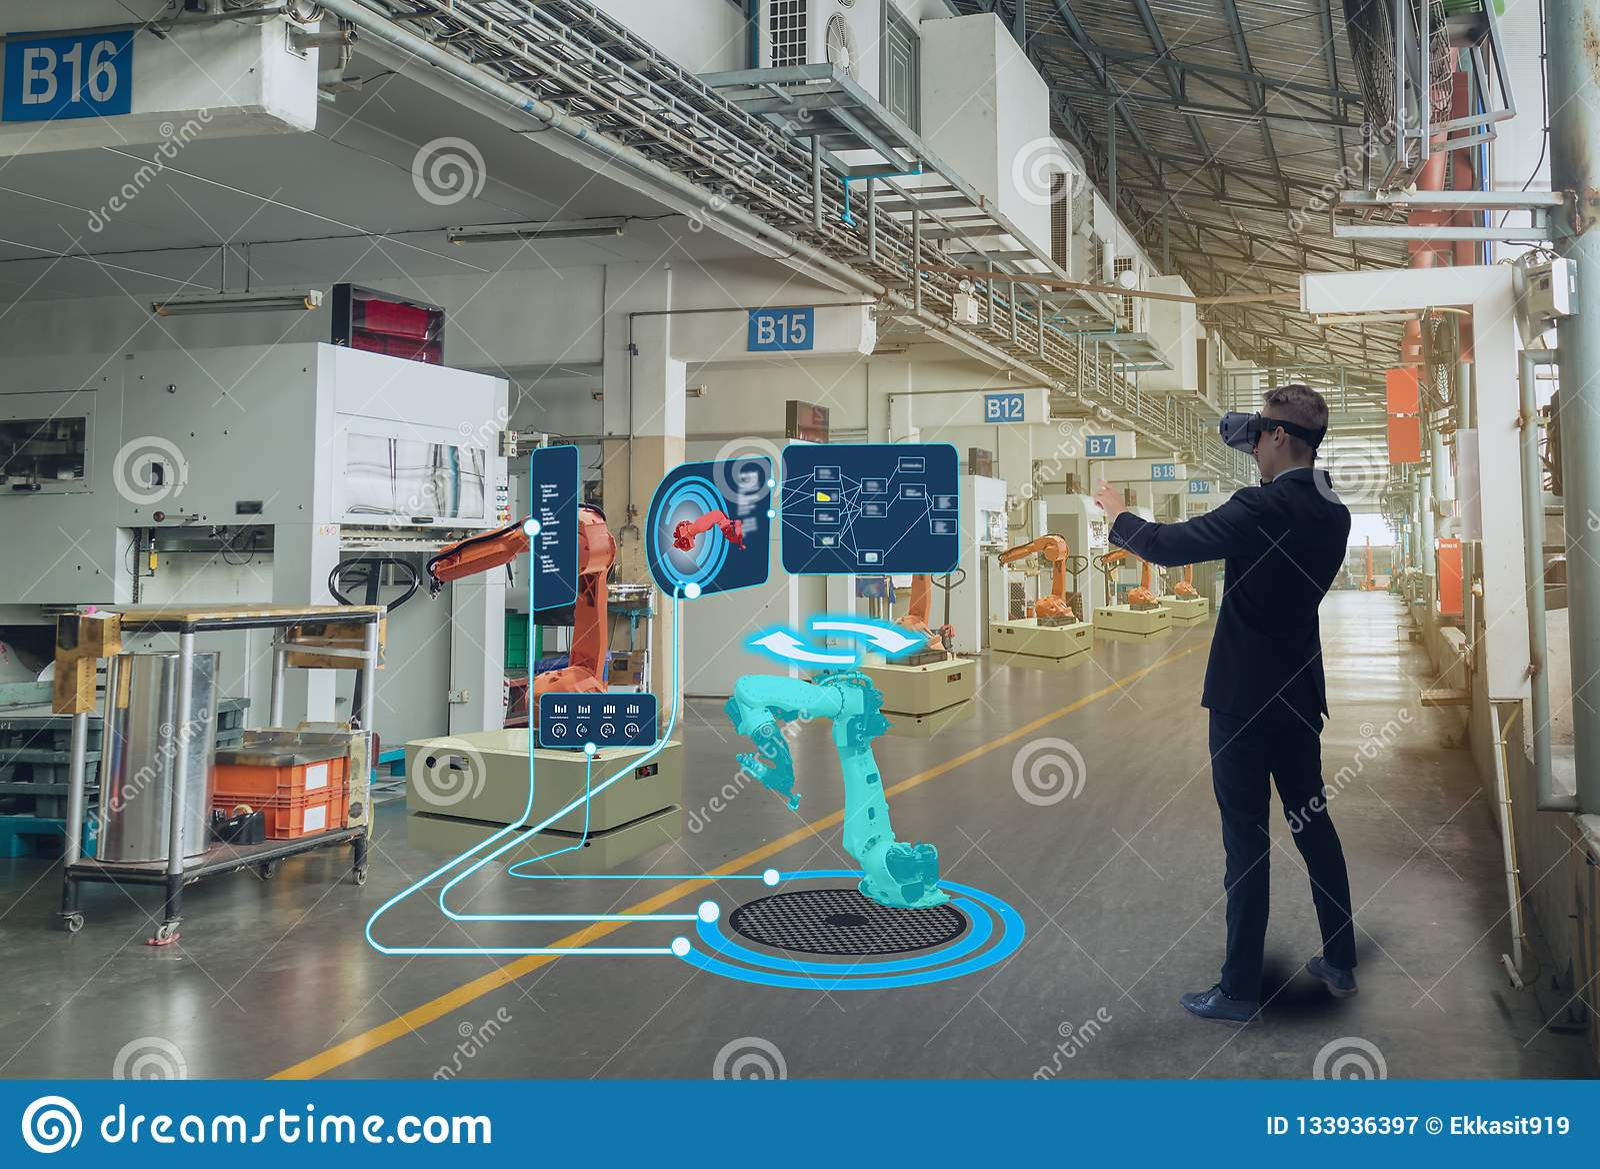 Iot聪明的技术未来派在产业4 0个概念,工程师用途增添了混杂的虚拟现实对教育和训练,r